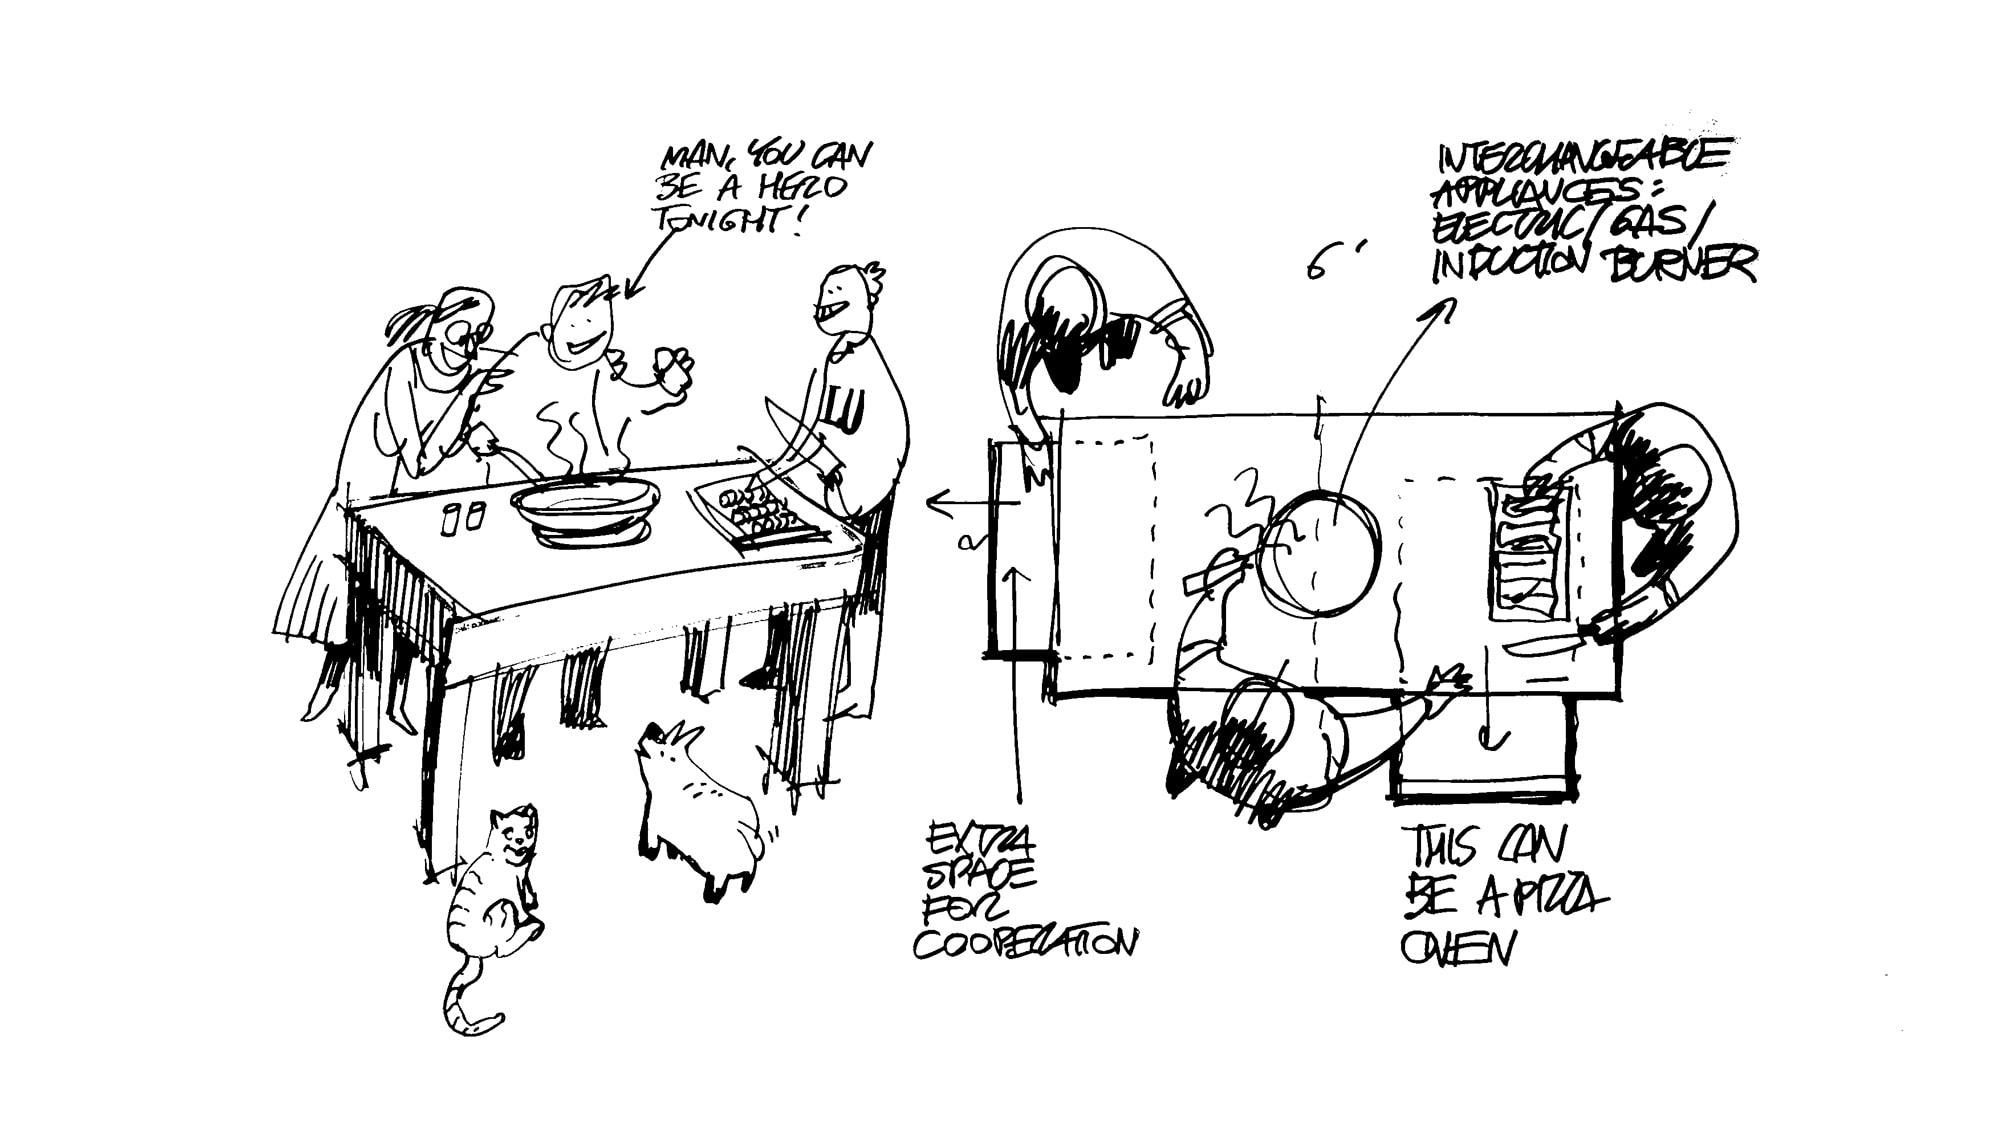 The Louisville Table – SZCZ